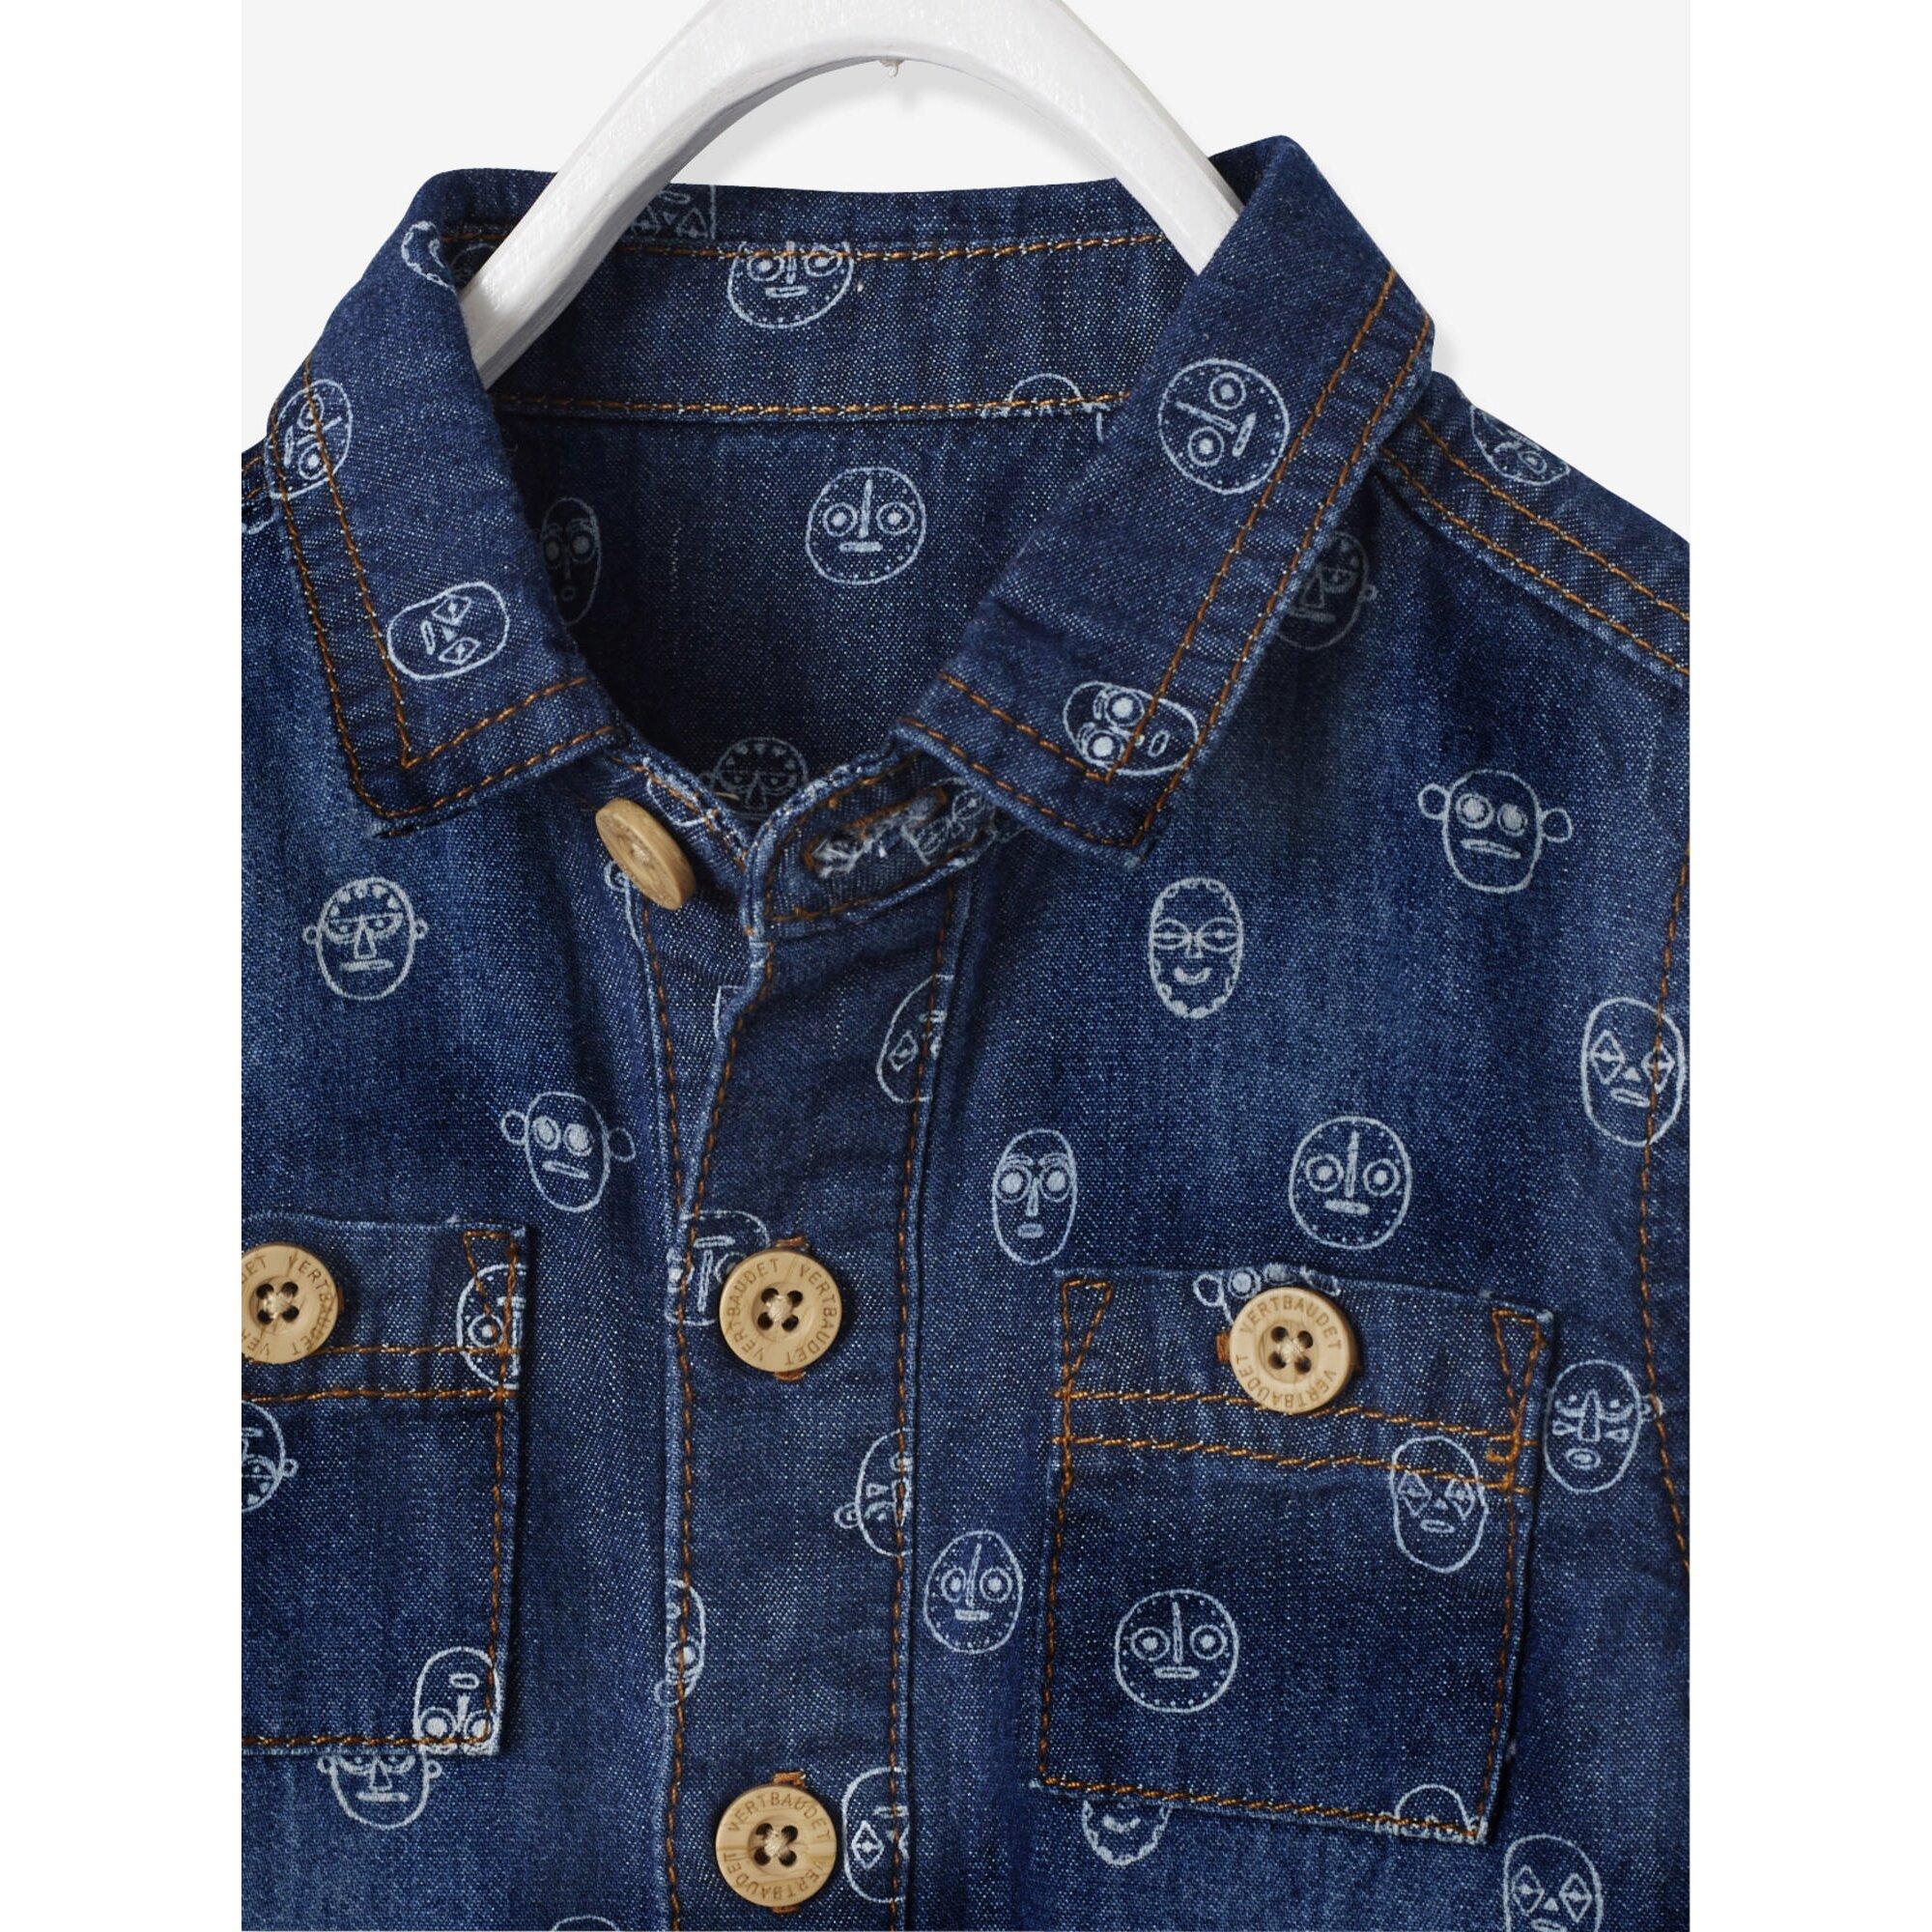 vertbaudet-jeanshemd-fur-baby-jungen-bedruckt